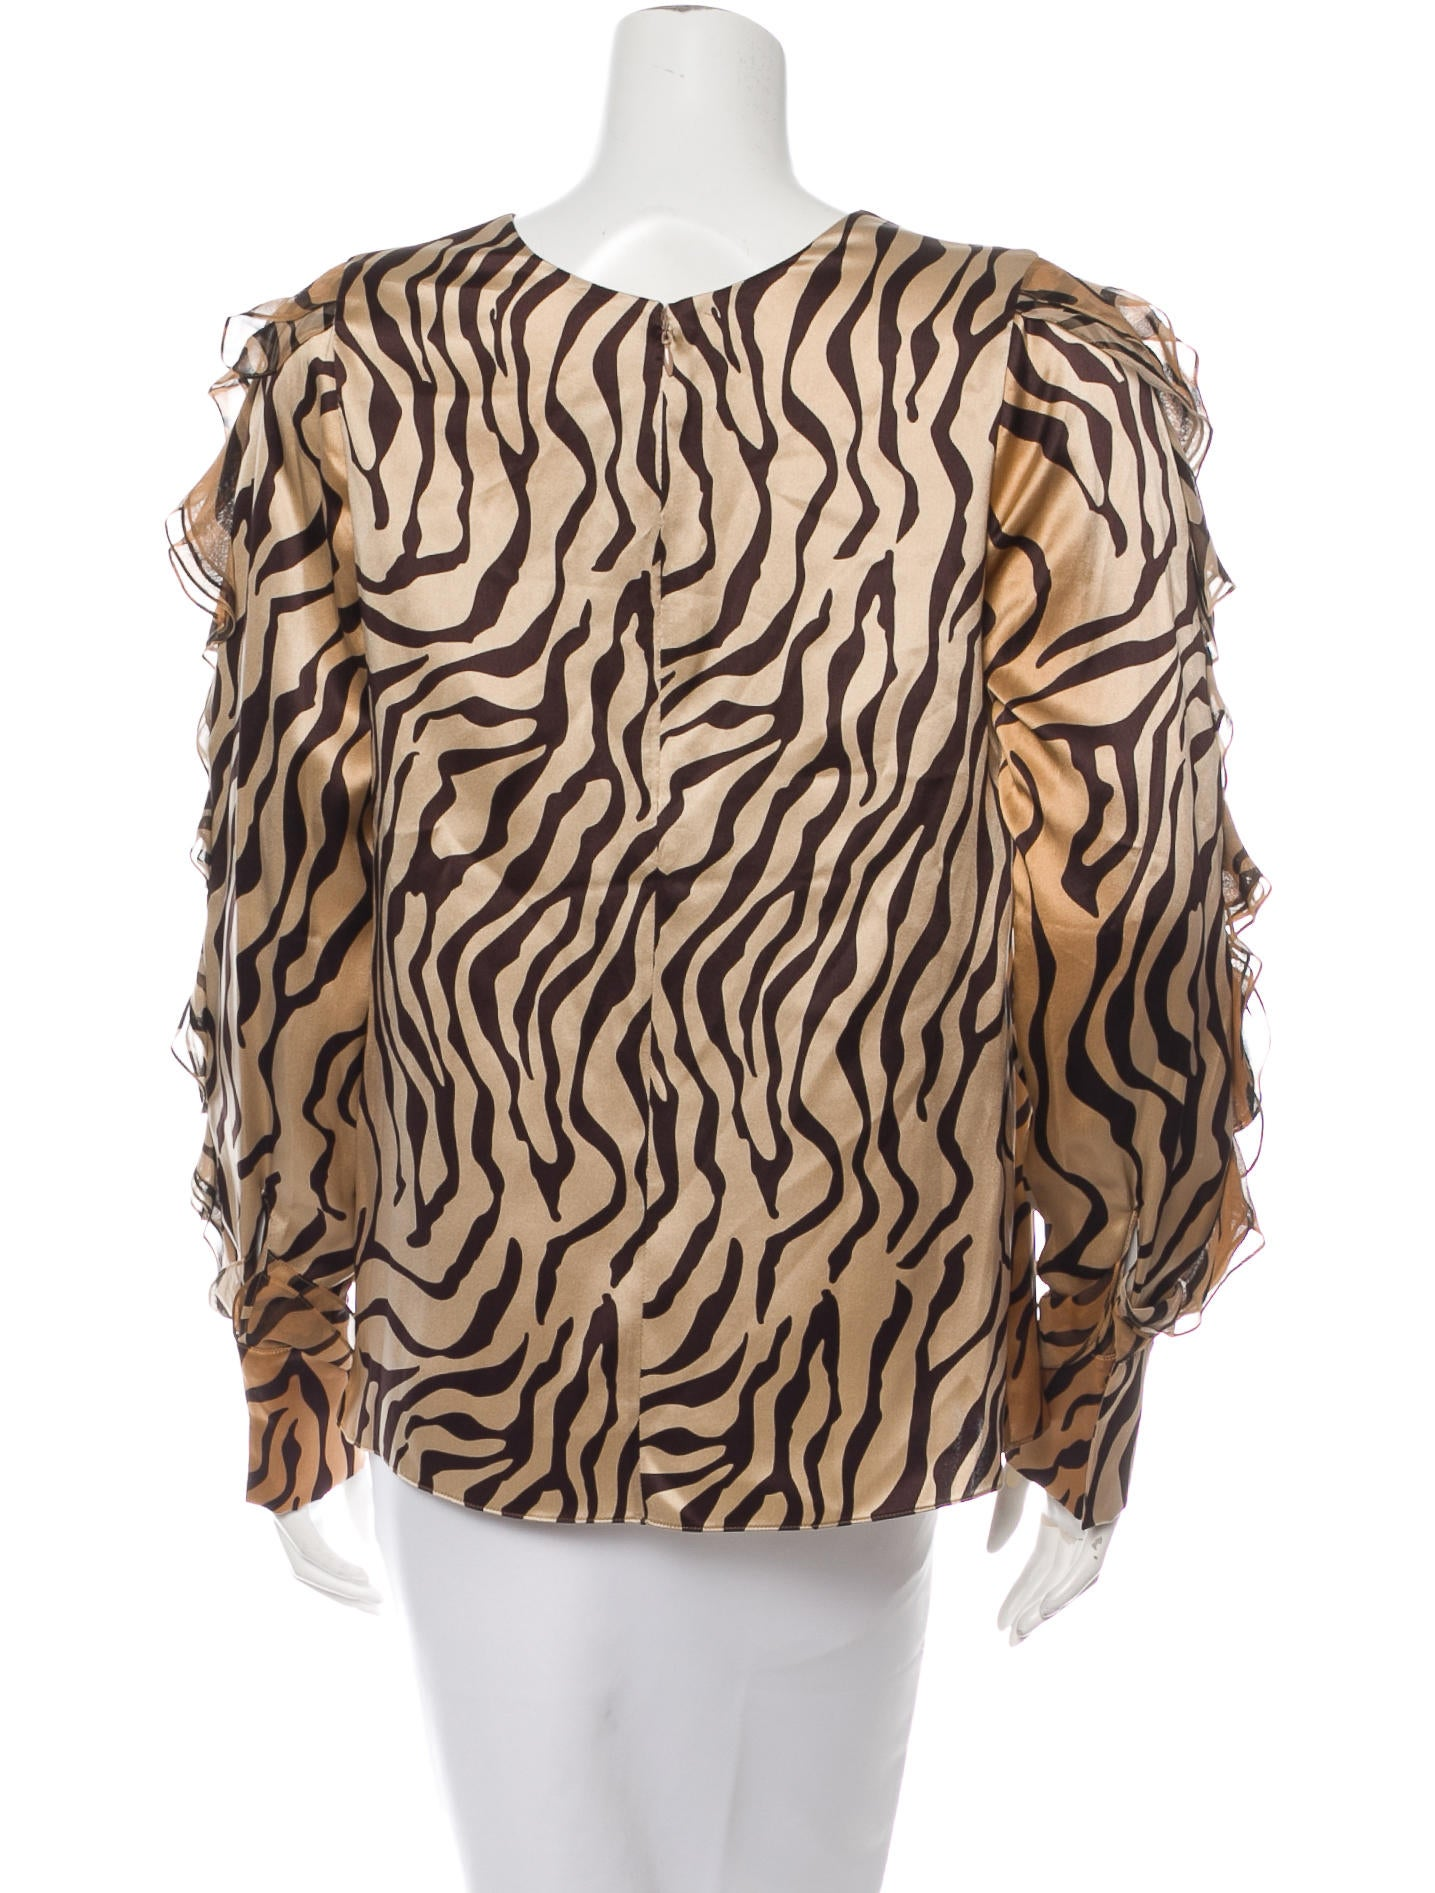 Thomas Wylde Silk Tiger Print Blouse Clothing Thm23752